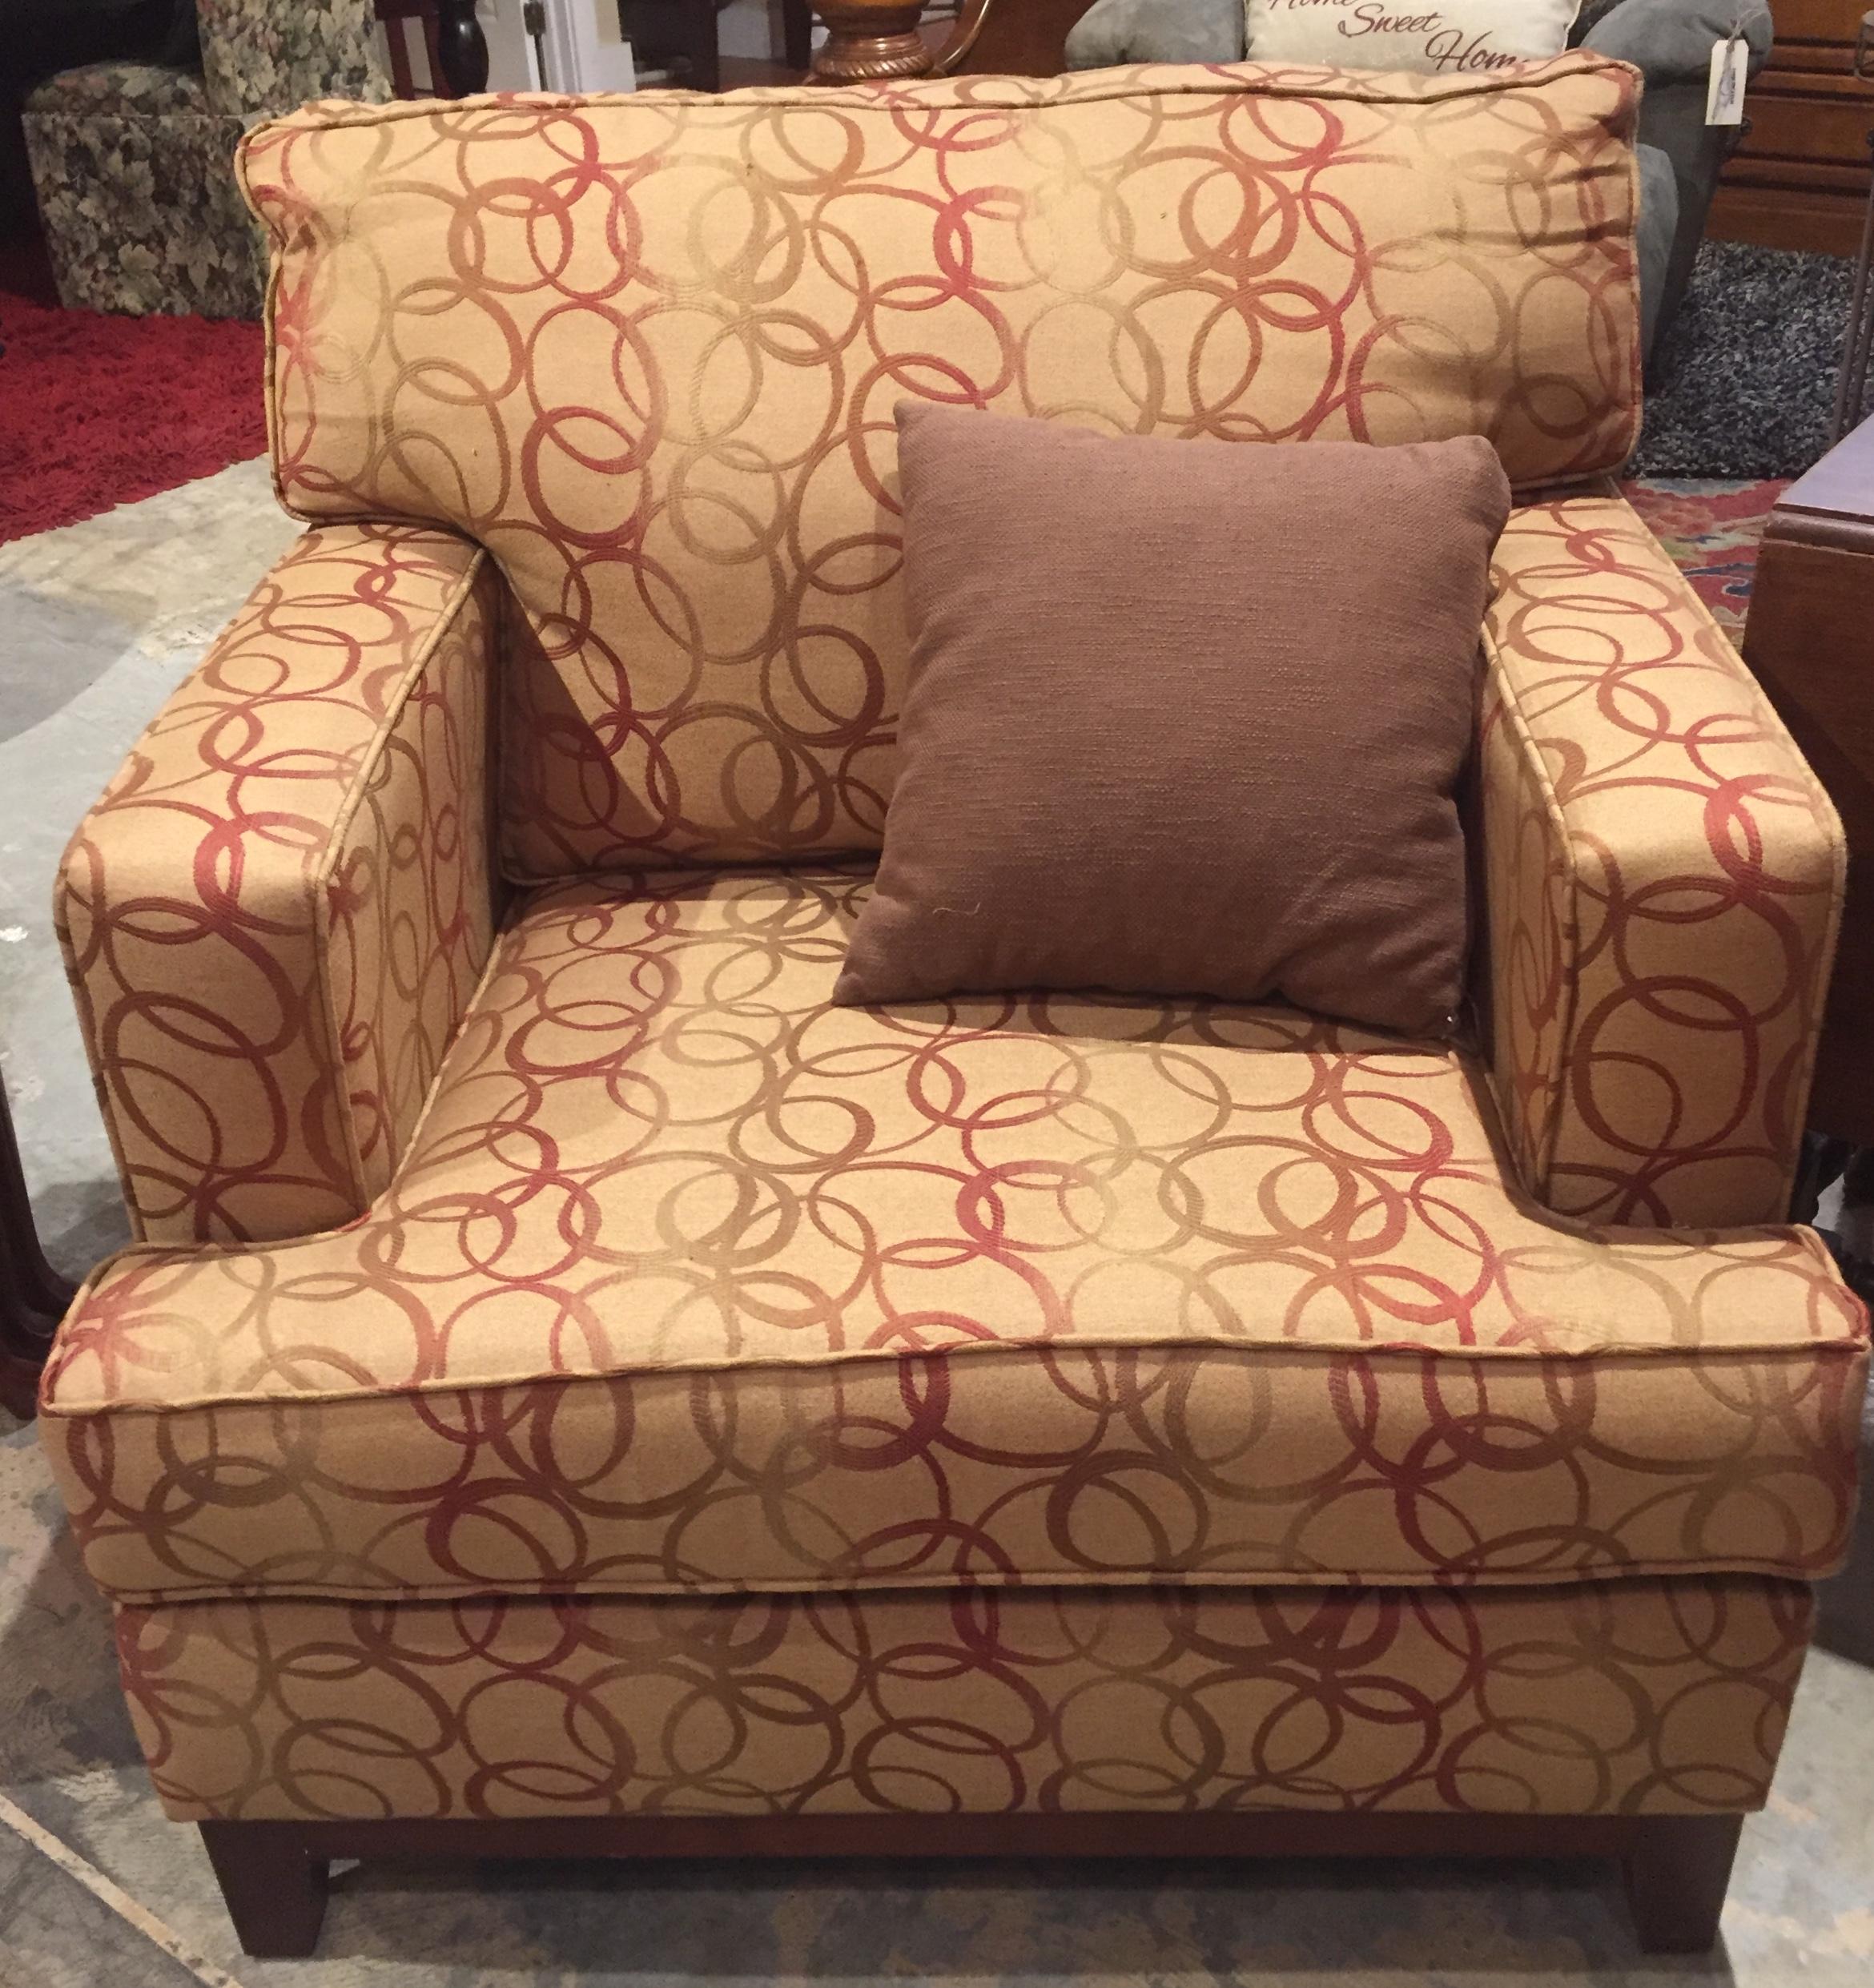 Charles Schneider Upholstered Chair $549.95 - C1108 24252